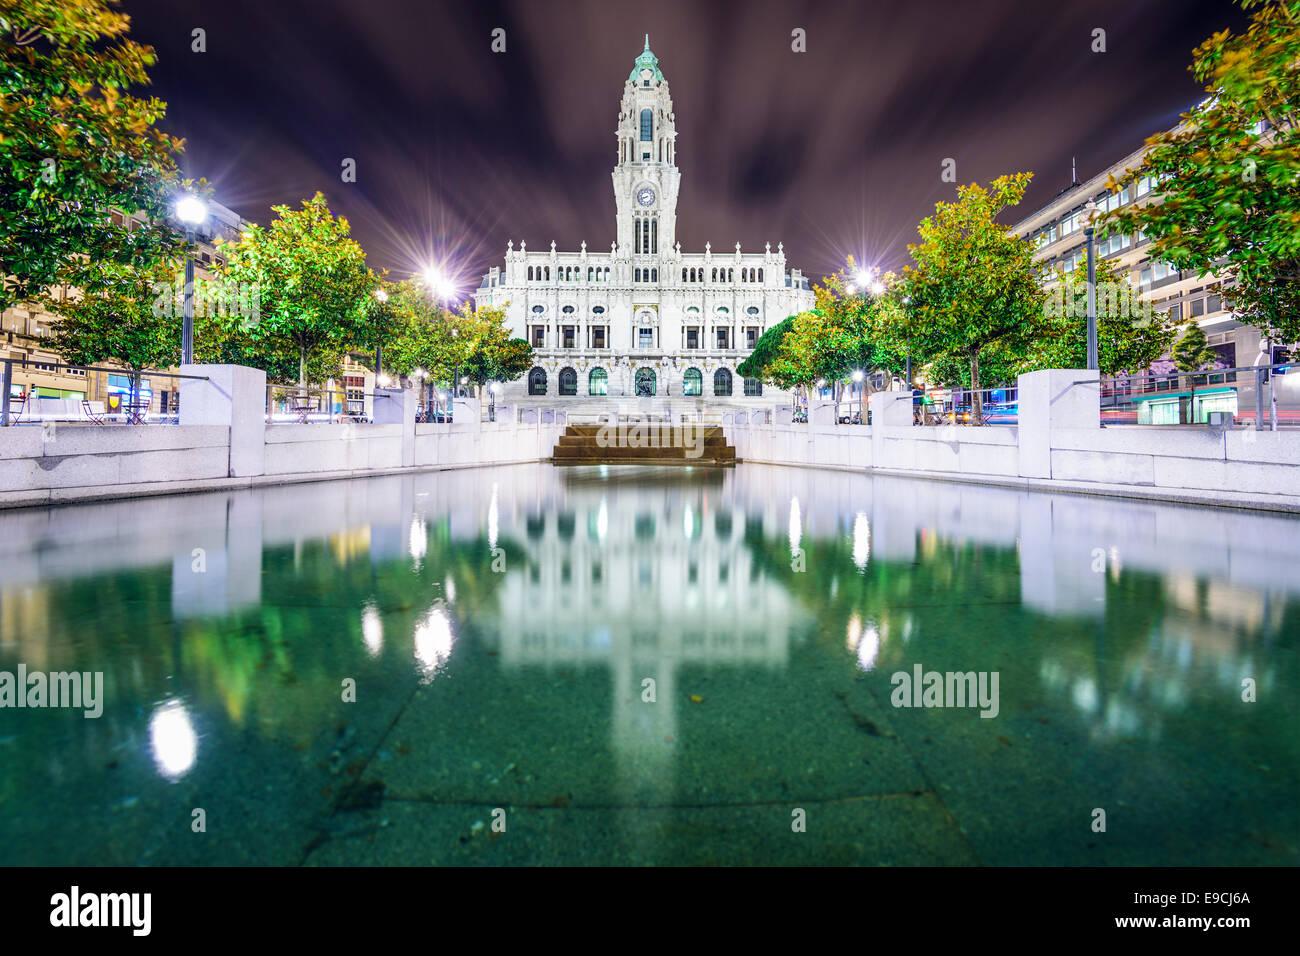 Porto, Portugal city hall at night. - Stock Image